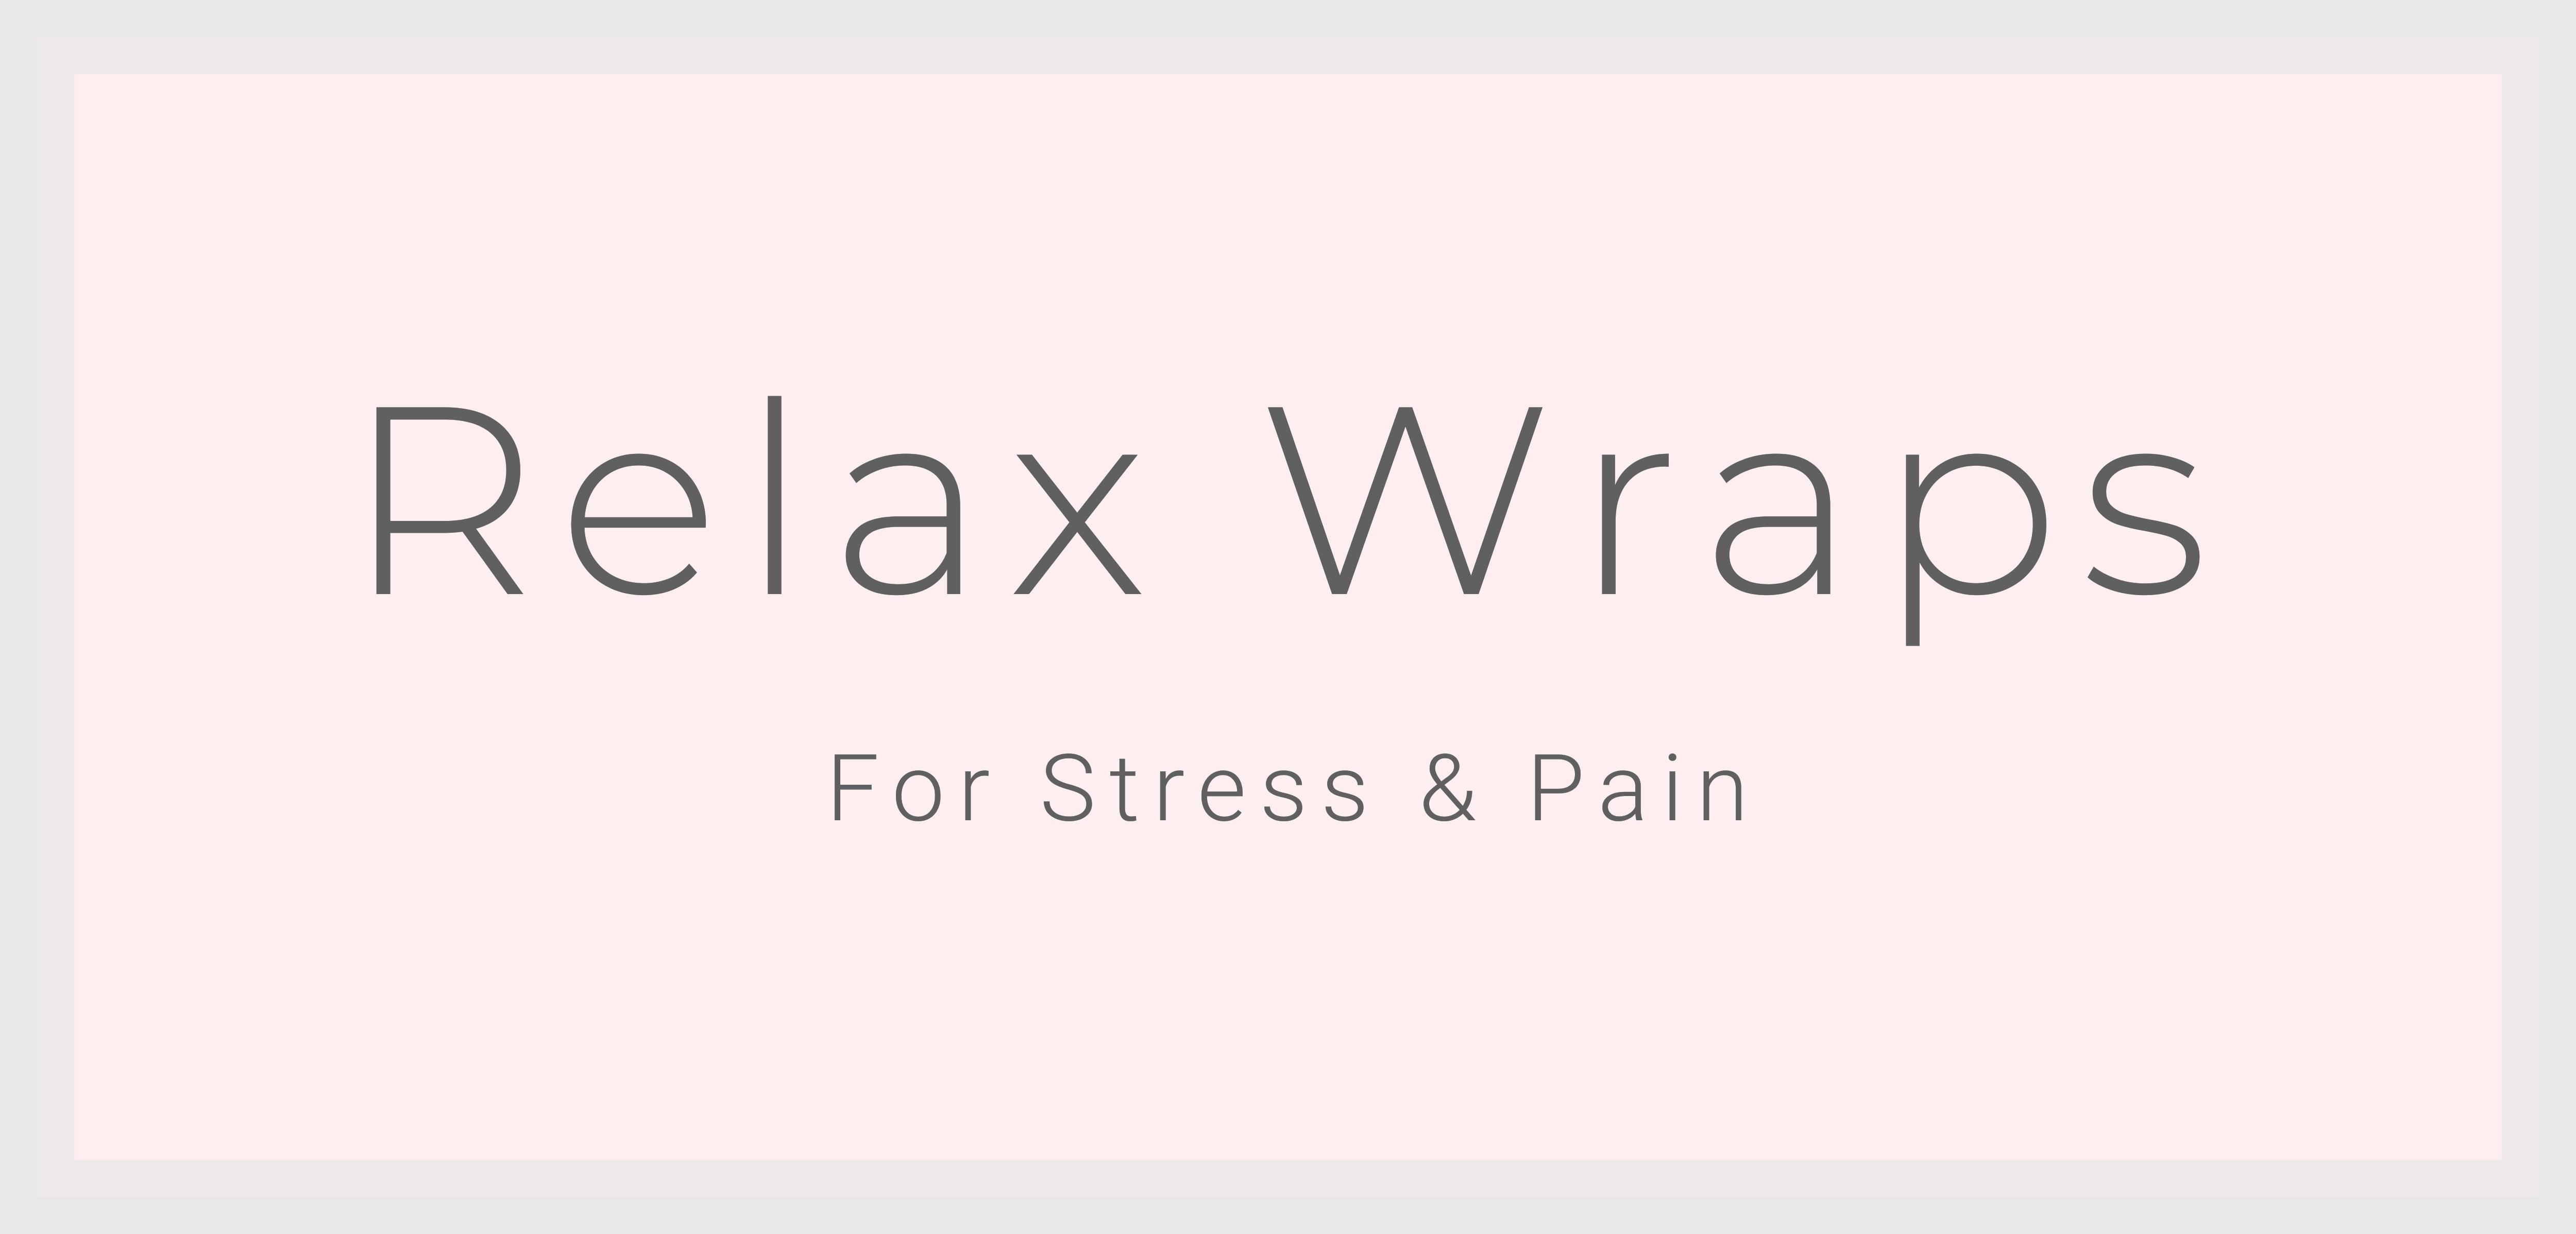 Relax Wraps